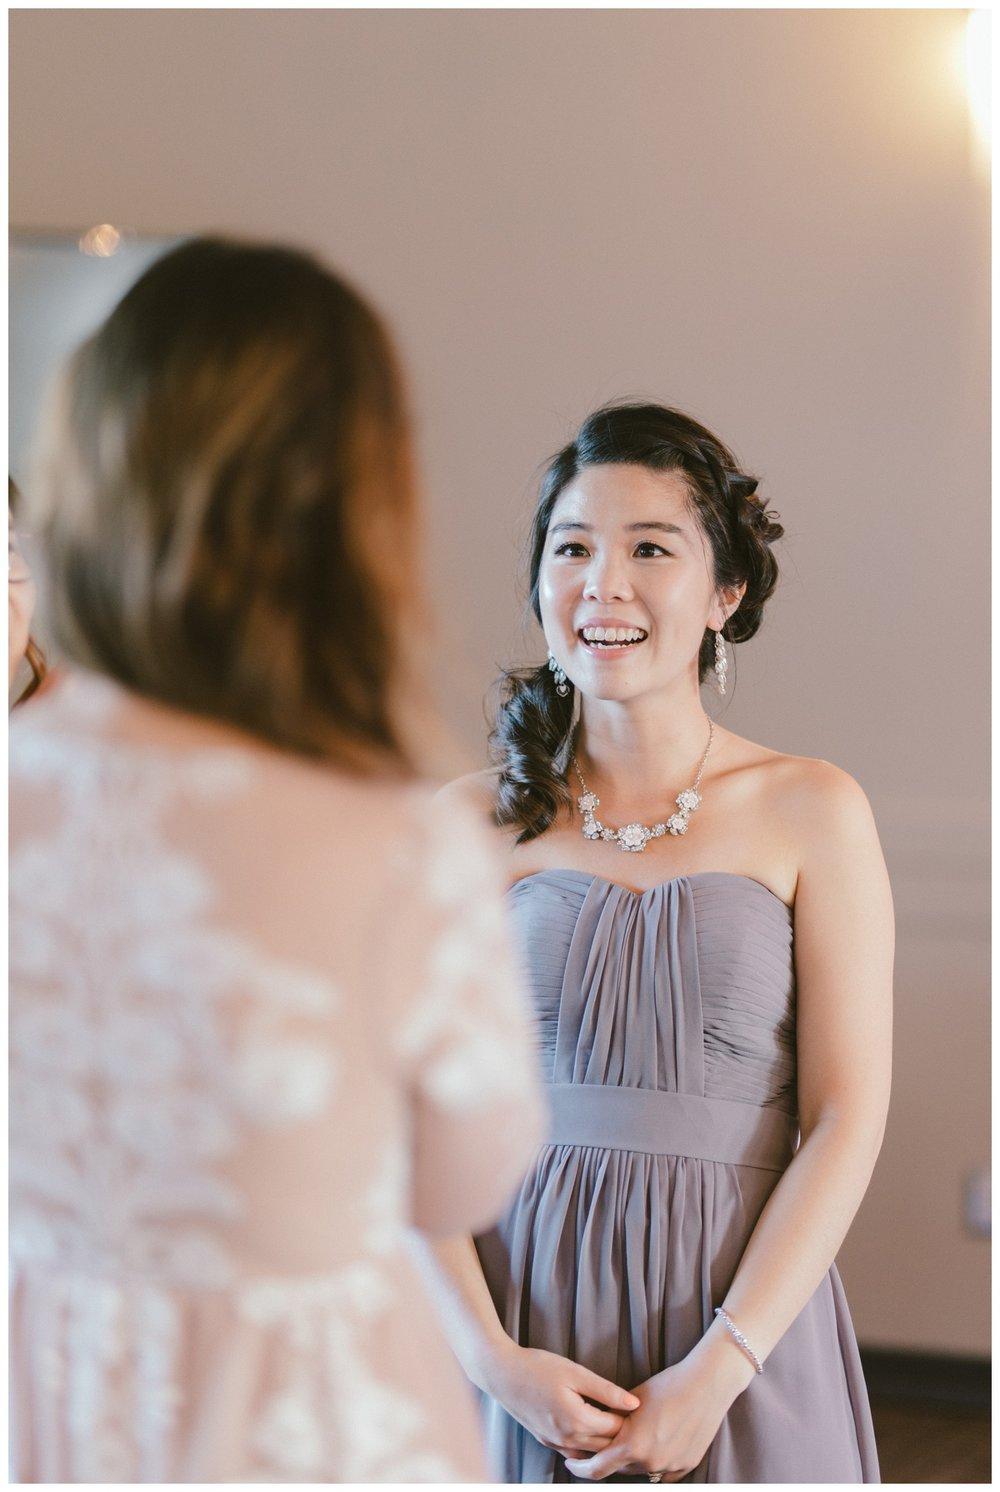 Mattie C. Fine Art Wedding Prewedding Photography Vancouver and Hong Kong 145.jpg